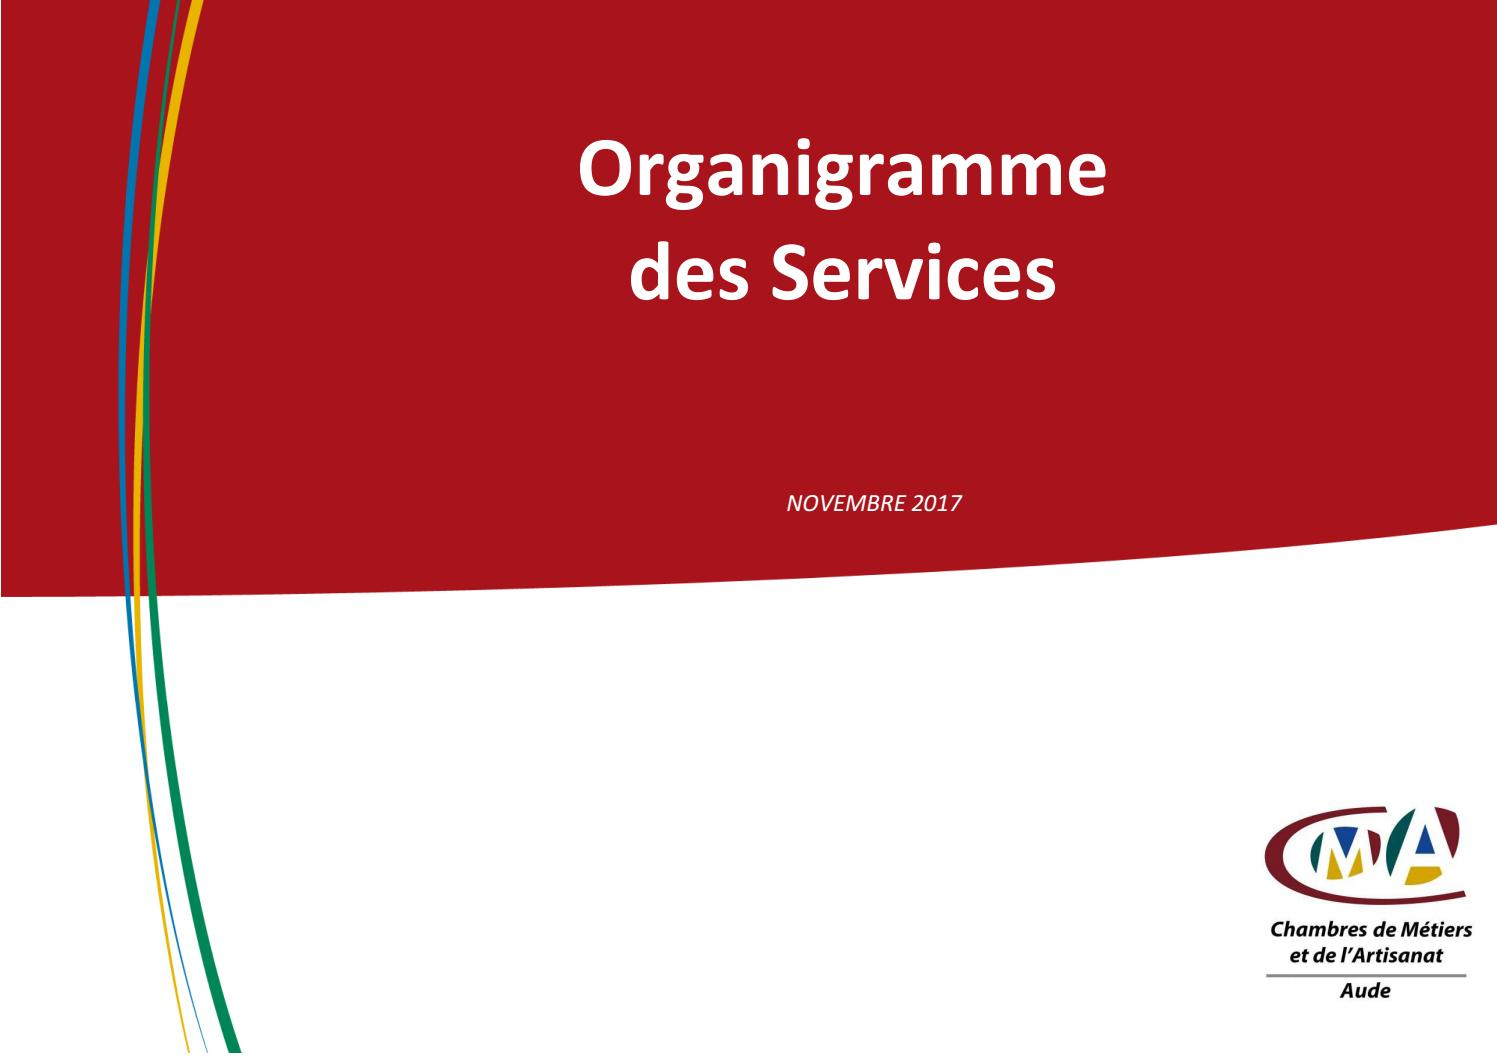 2017 11 20 Organigramme 2017 Cma11 Interne By Chambre à Chambre Des Metiers Carcassonne